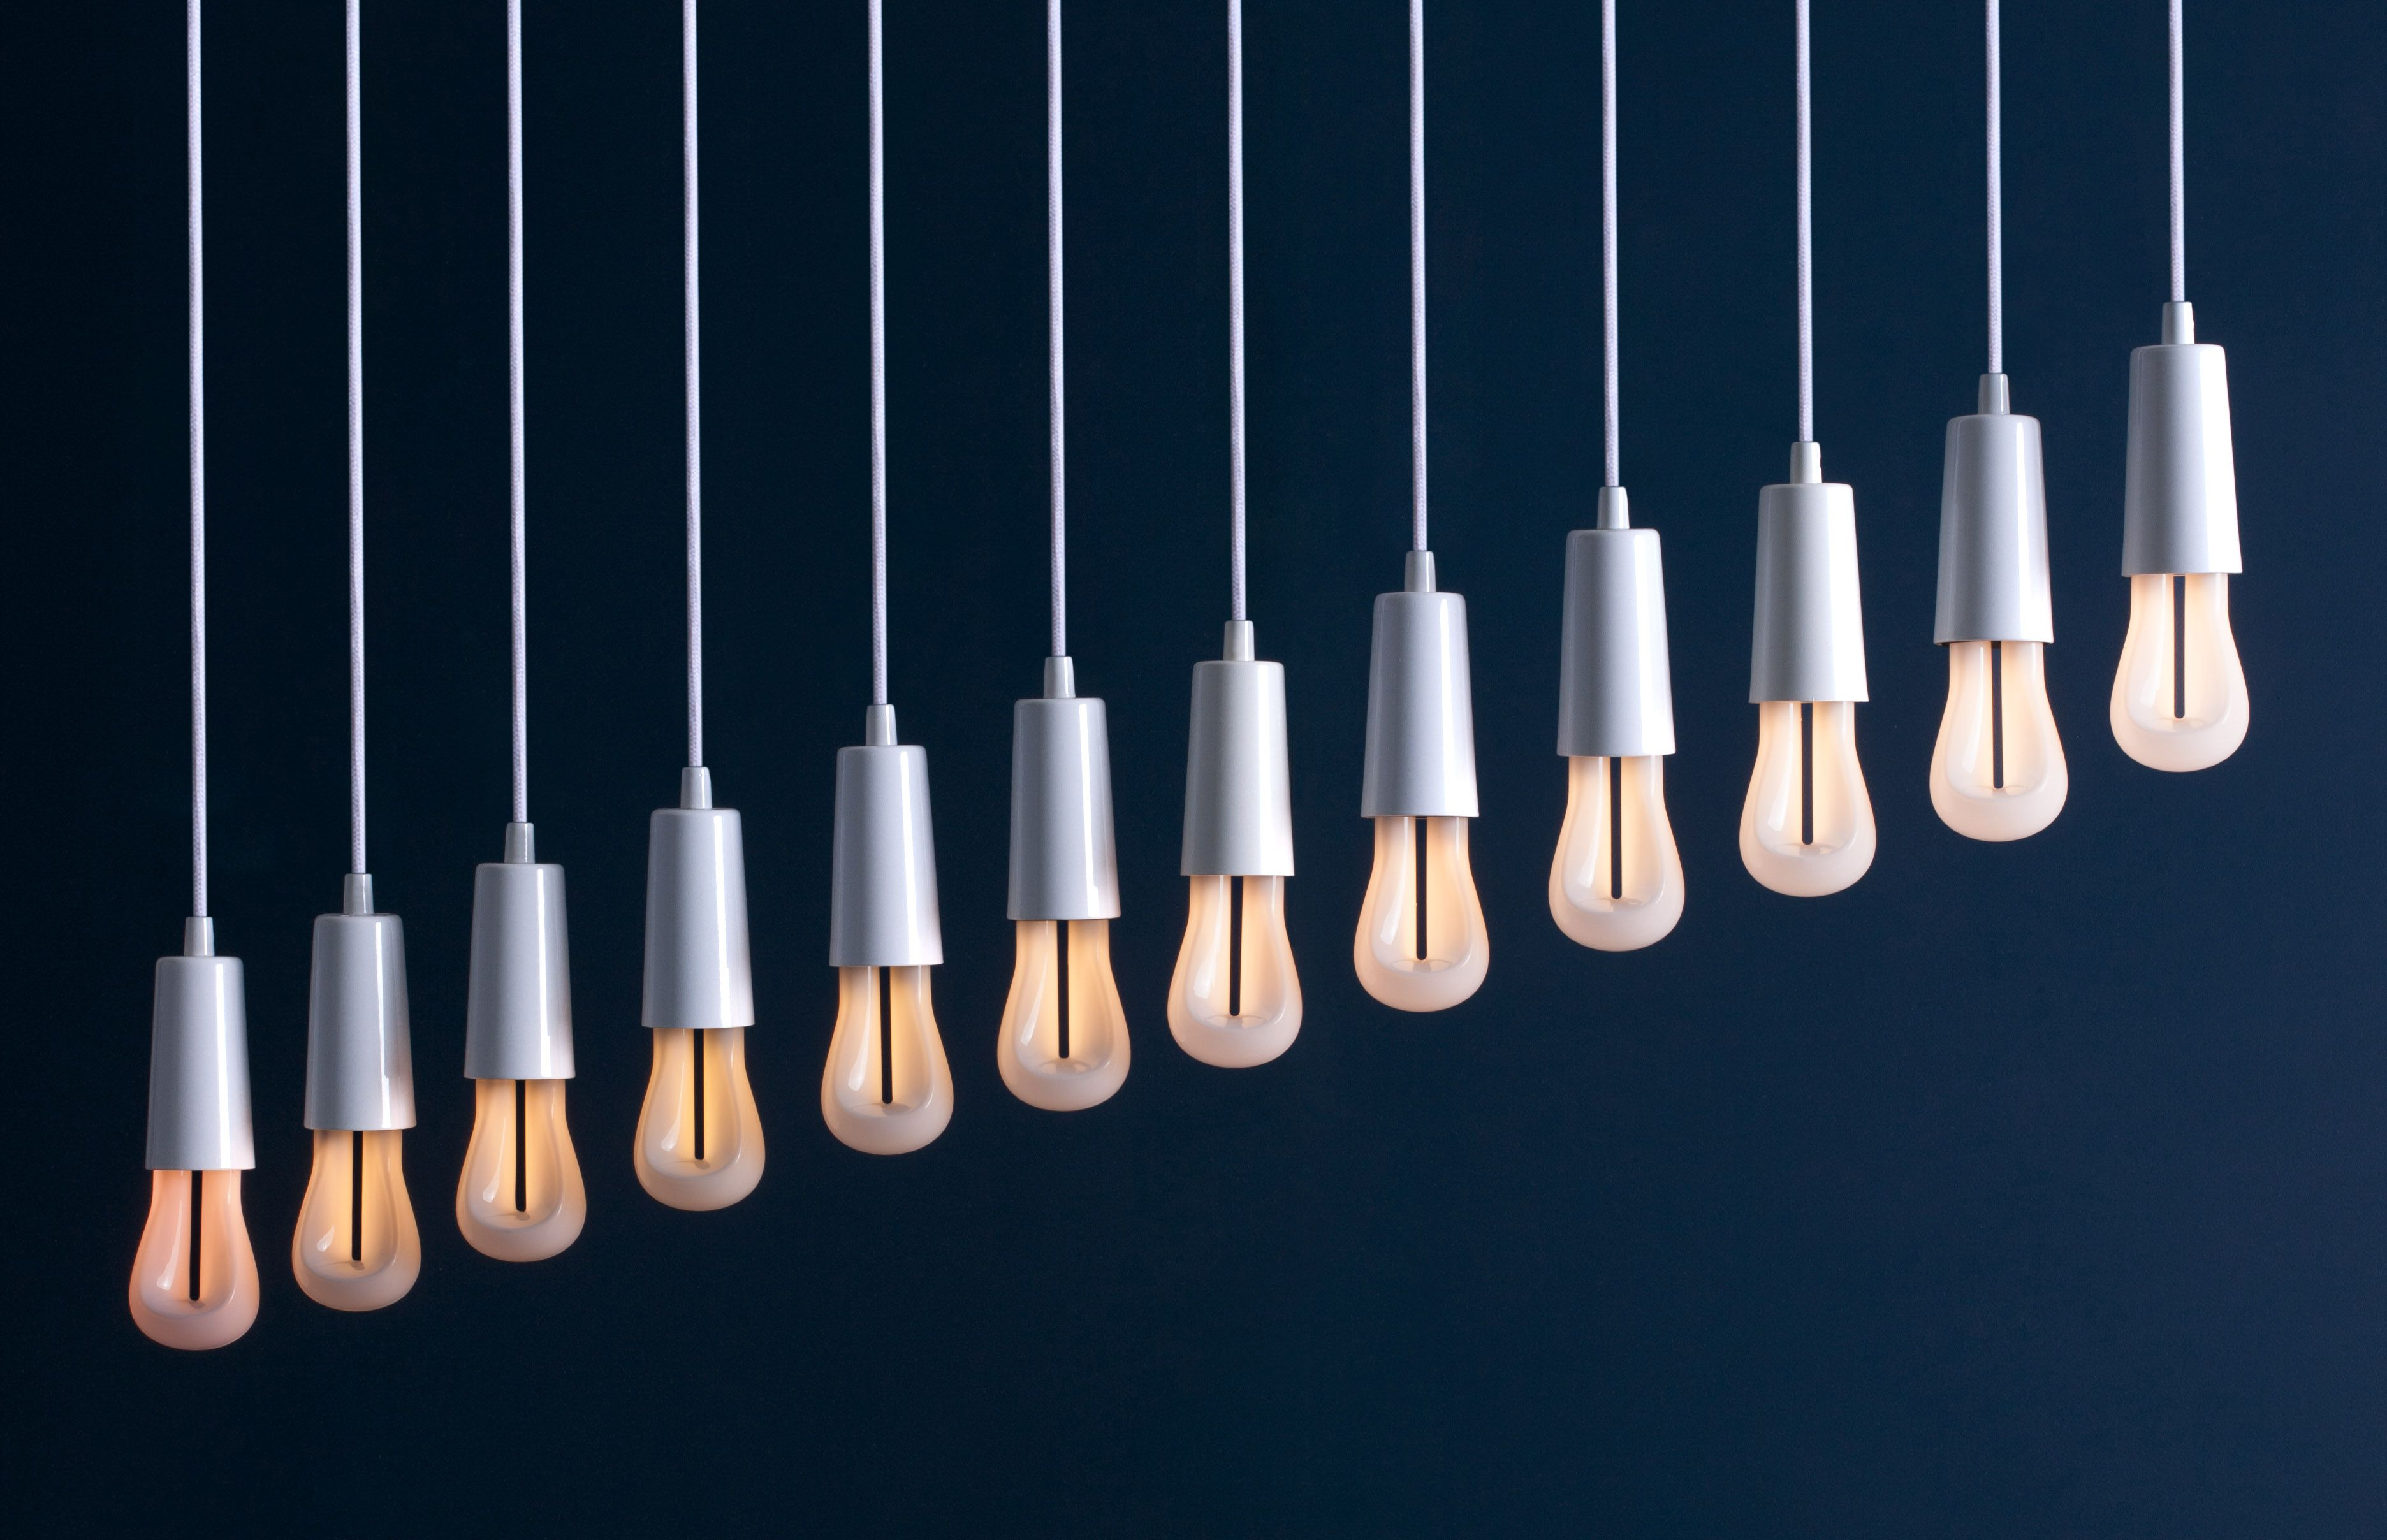 Dimmable Led Desk Lamps Reviews Taotronics Led Desk Lamp